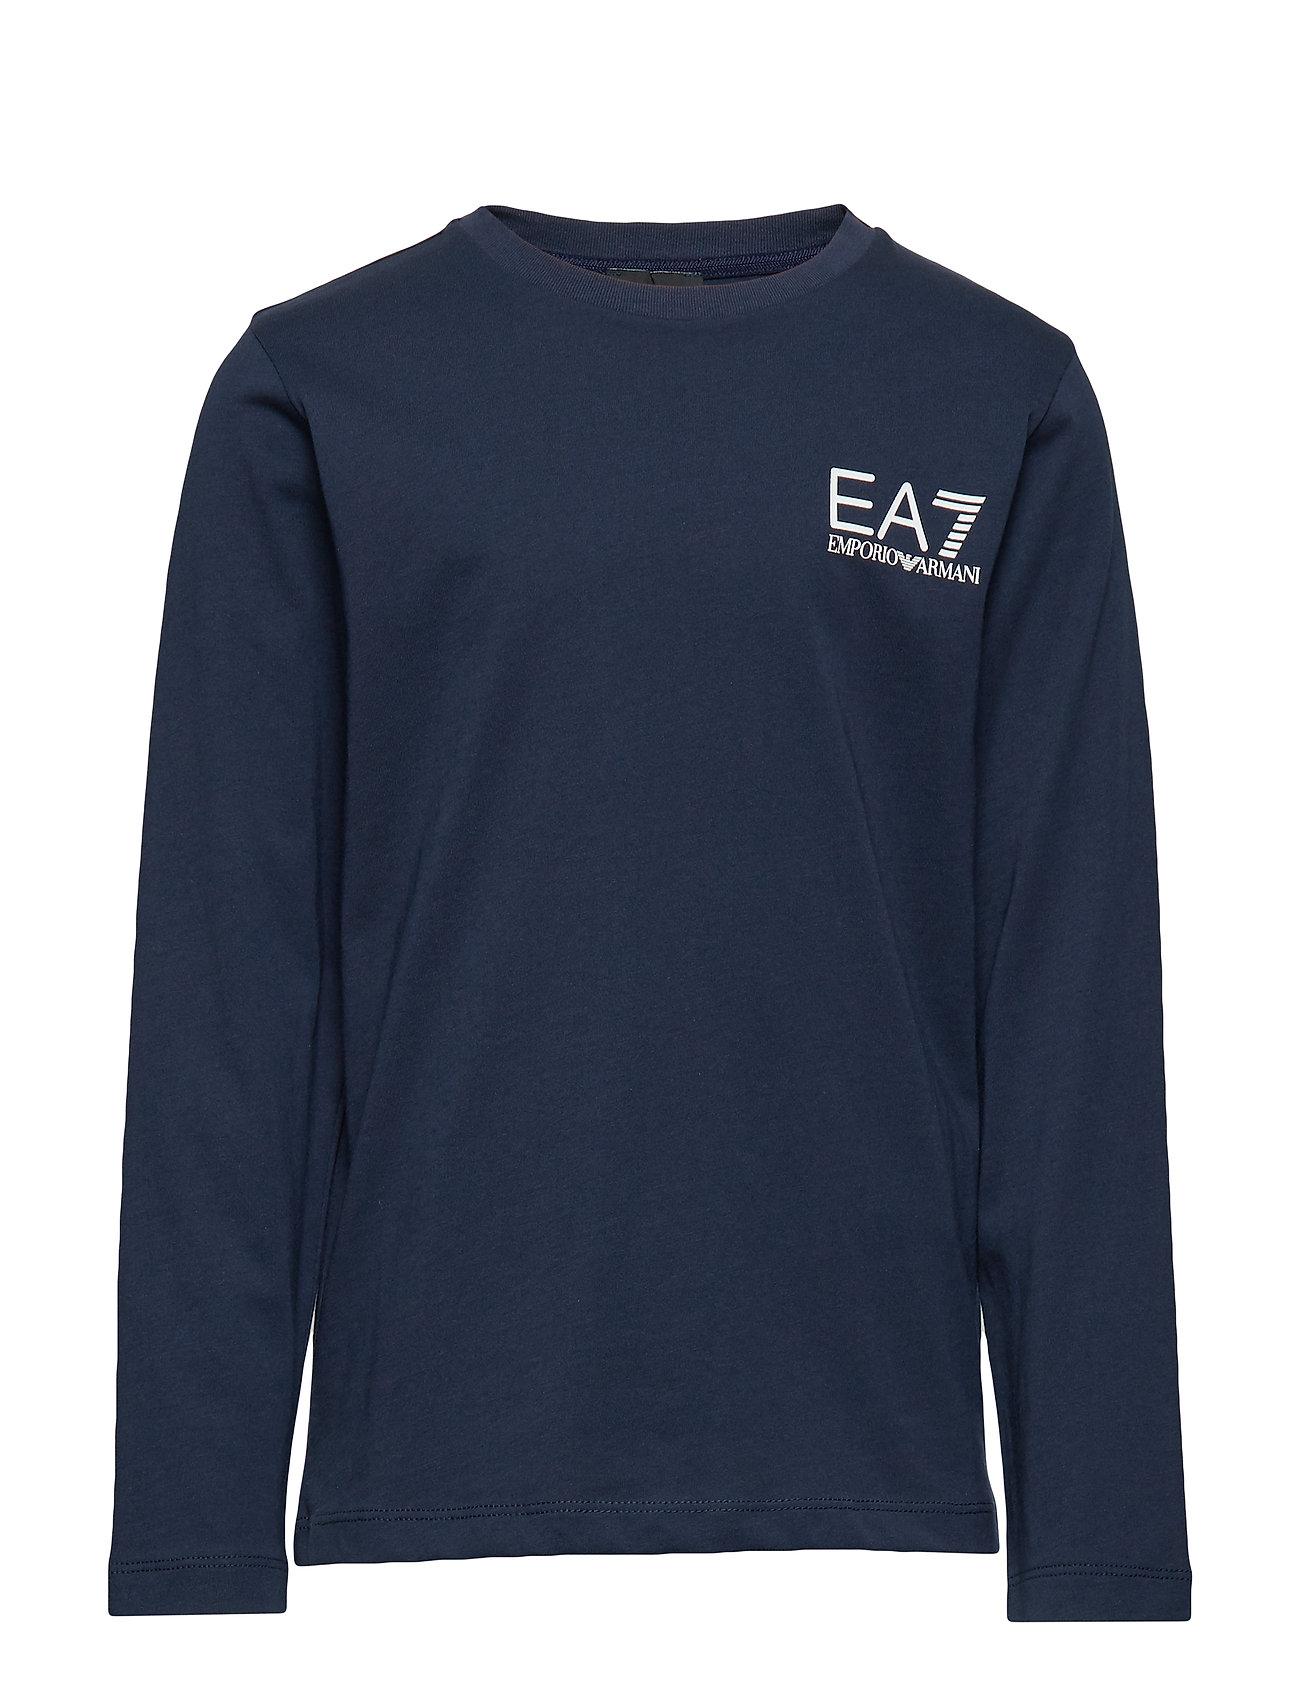 Image of T-Shirt T-Langærmet Skjorte Blå EA7 (3204841363)